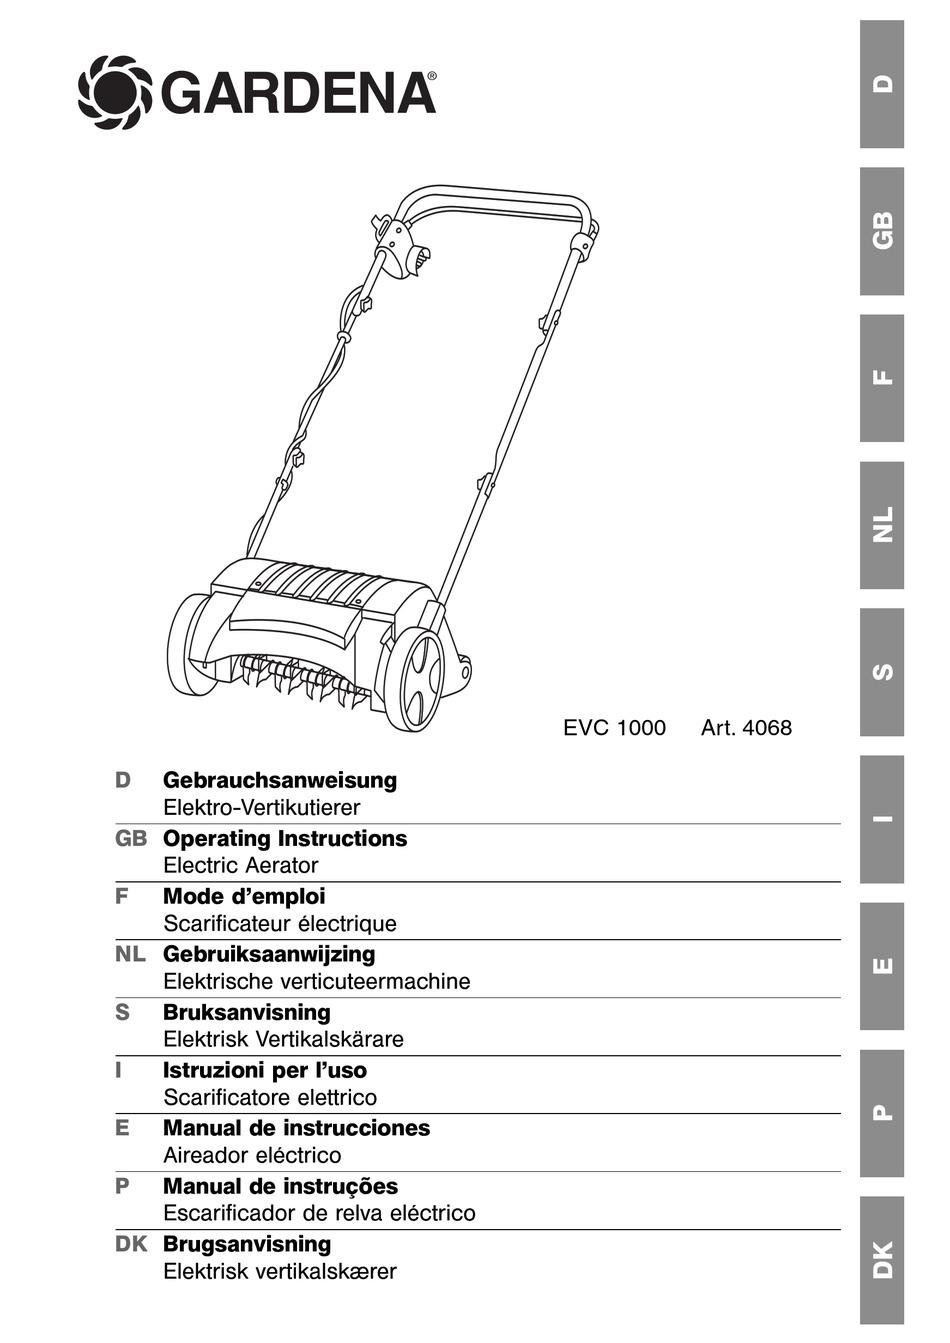 Gardena Electric Lawn Aerator Evc 1000